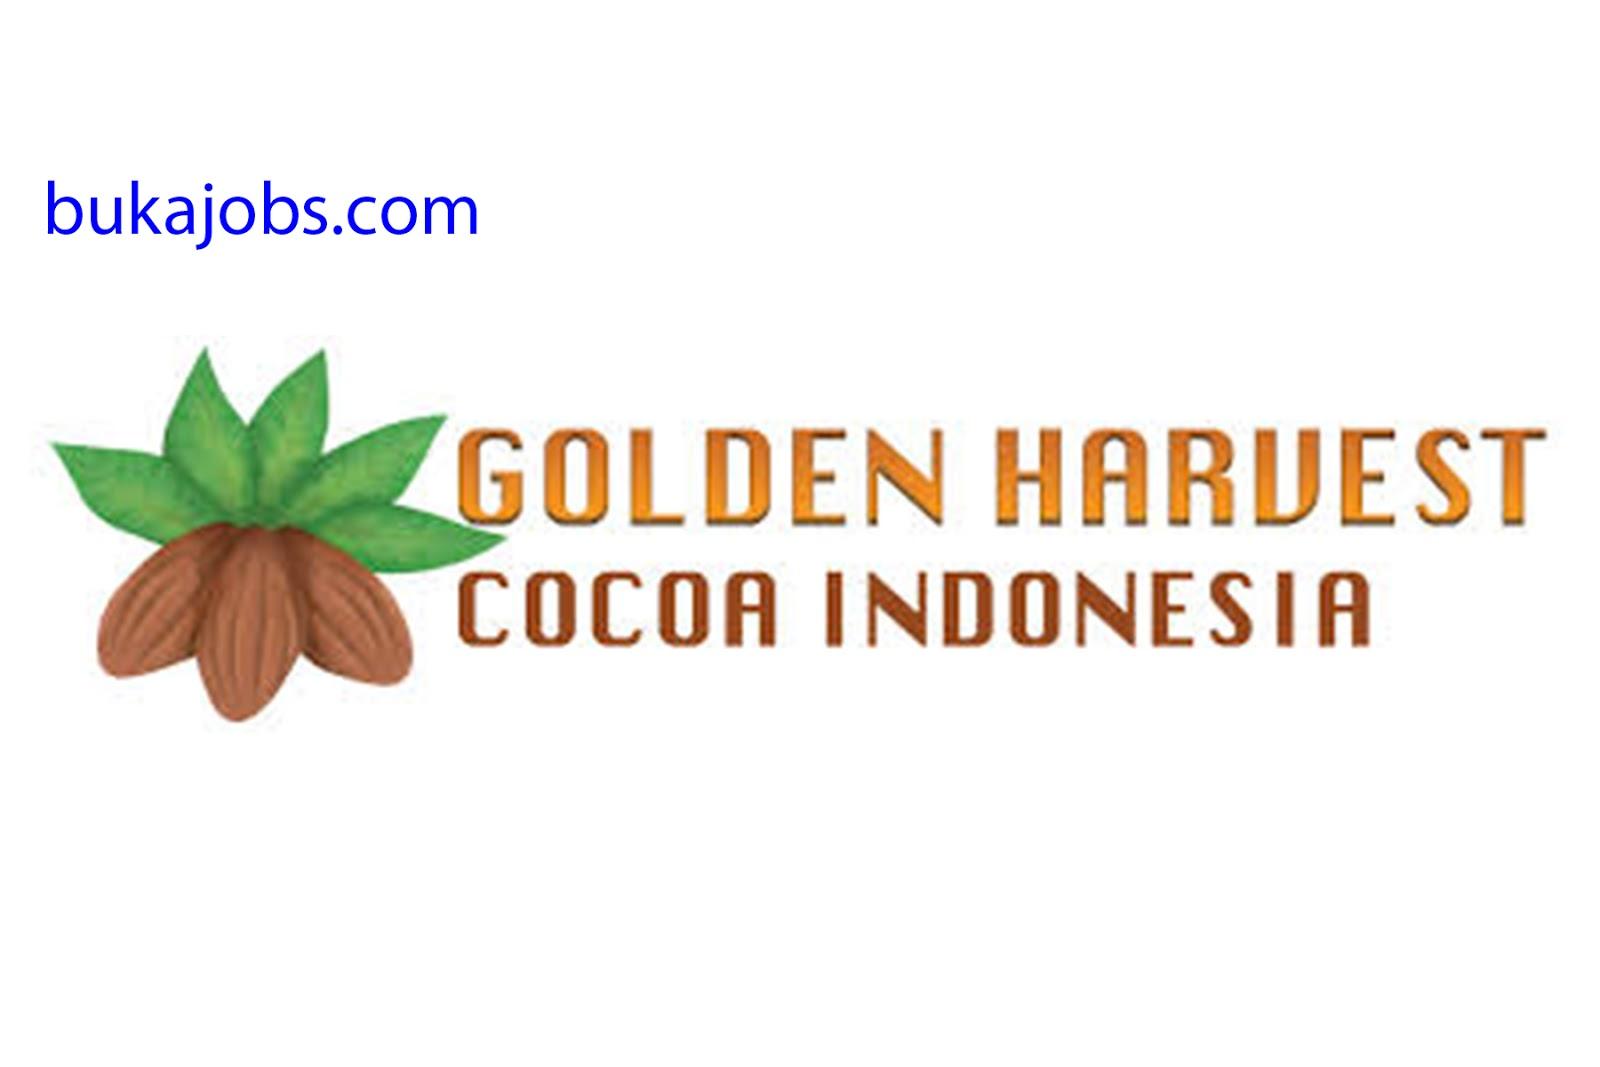 Lowongan Kerja PT Golden Harvest Cocoa Indonesia 2019